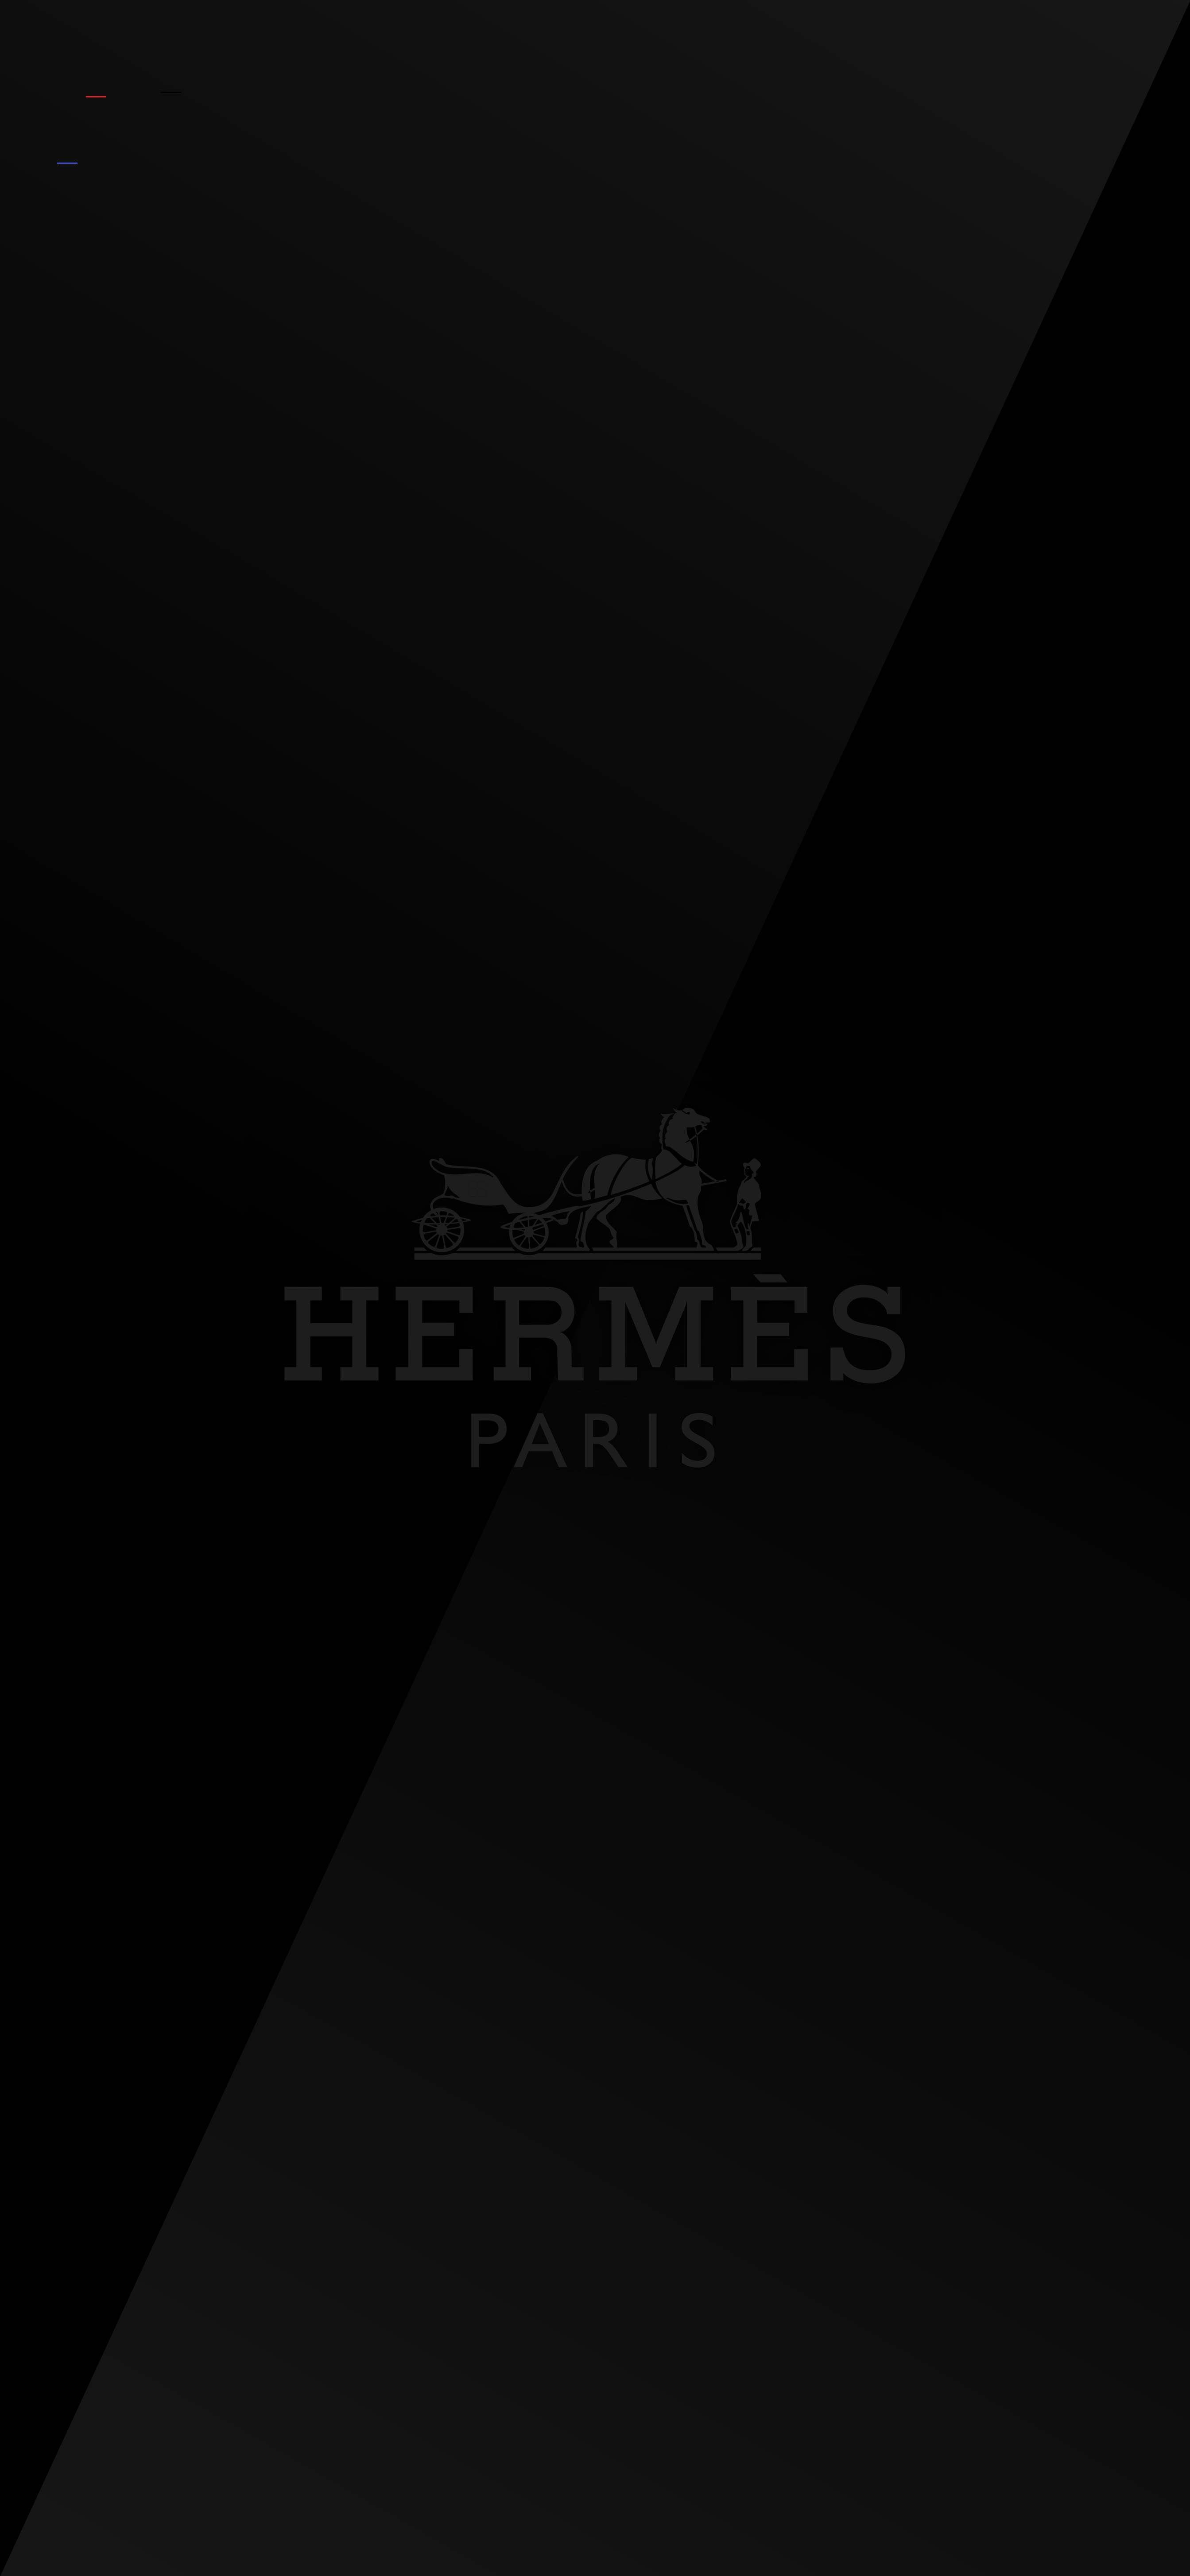 HERMÈS Wallpaper Refresh ios13wallpaper in 2020